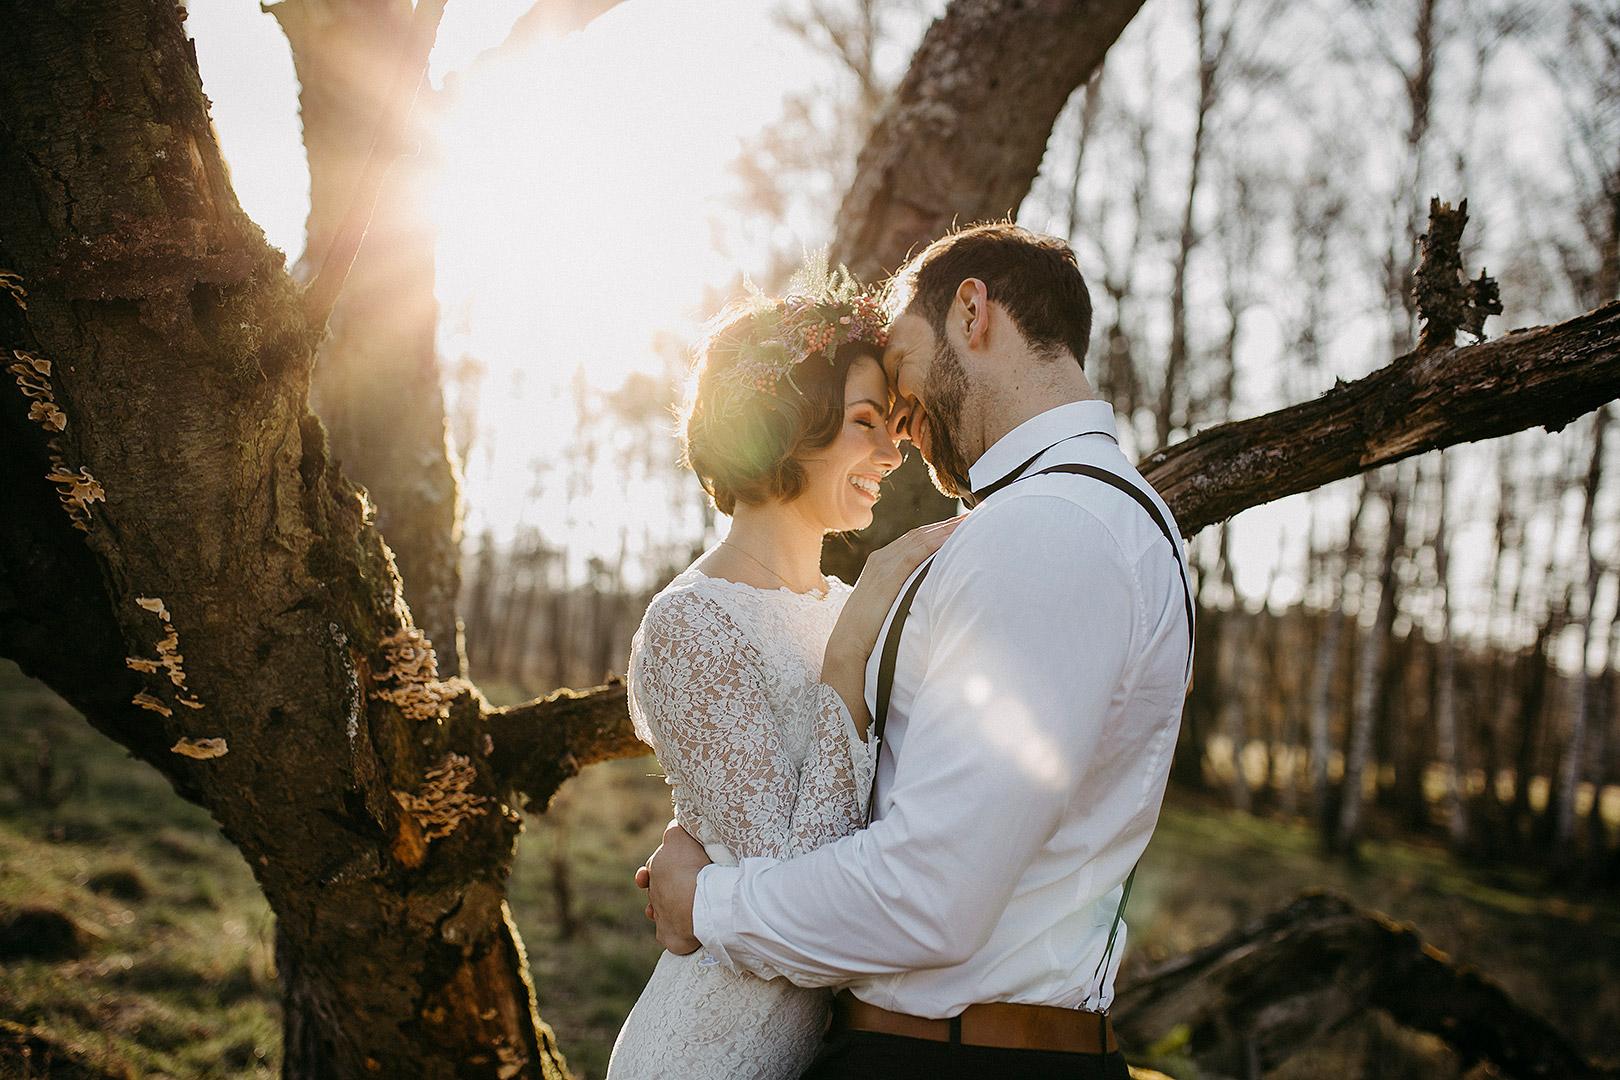 portrait_wedding_samundmartin_16